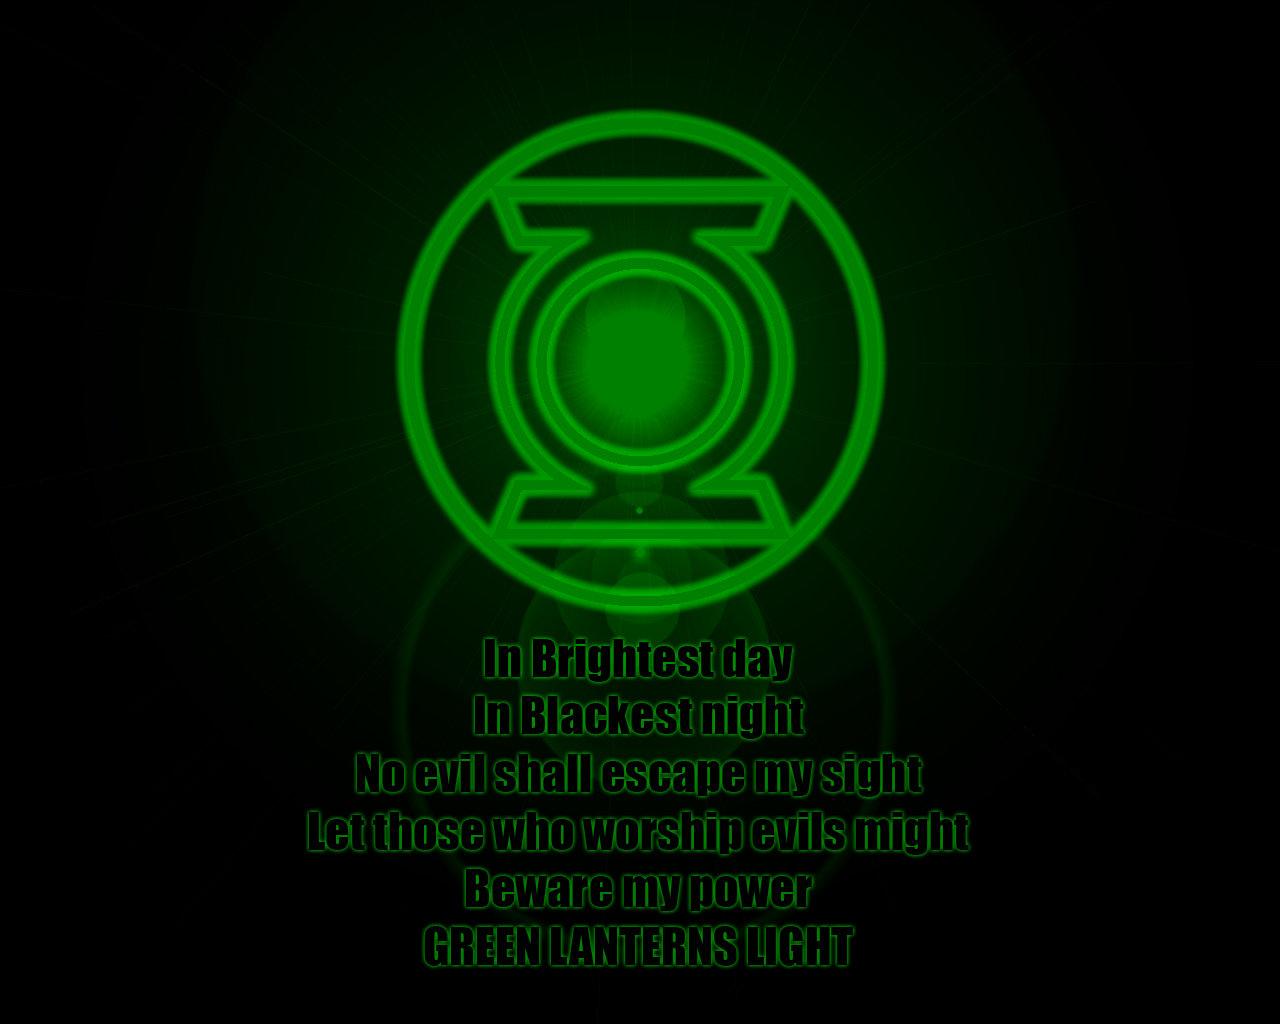 Green Lantern Oath 1280x1024